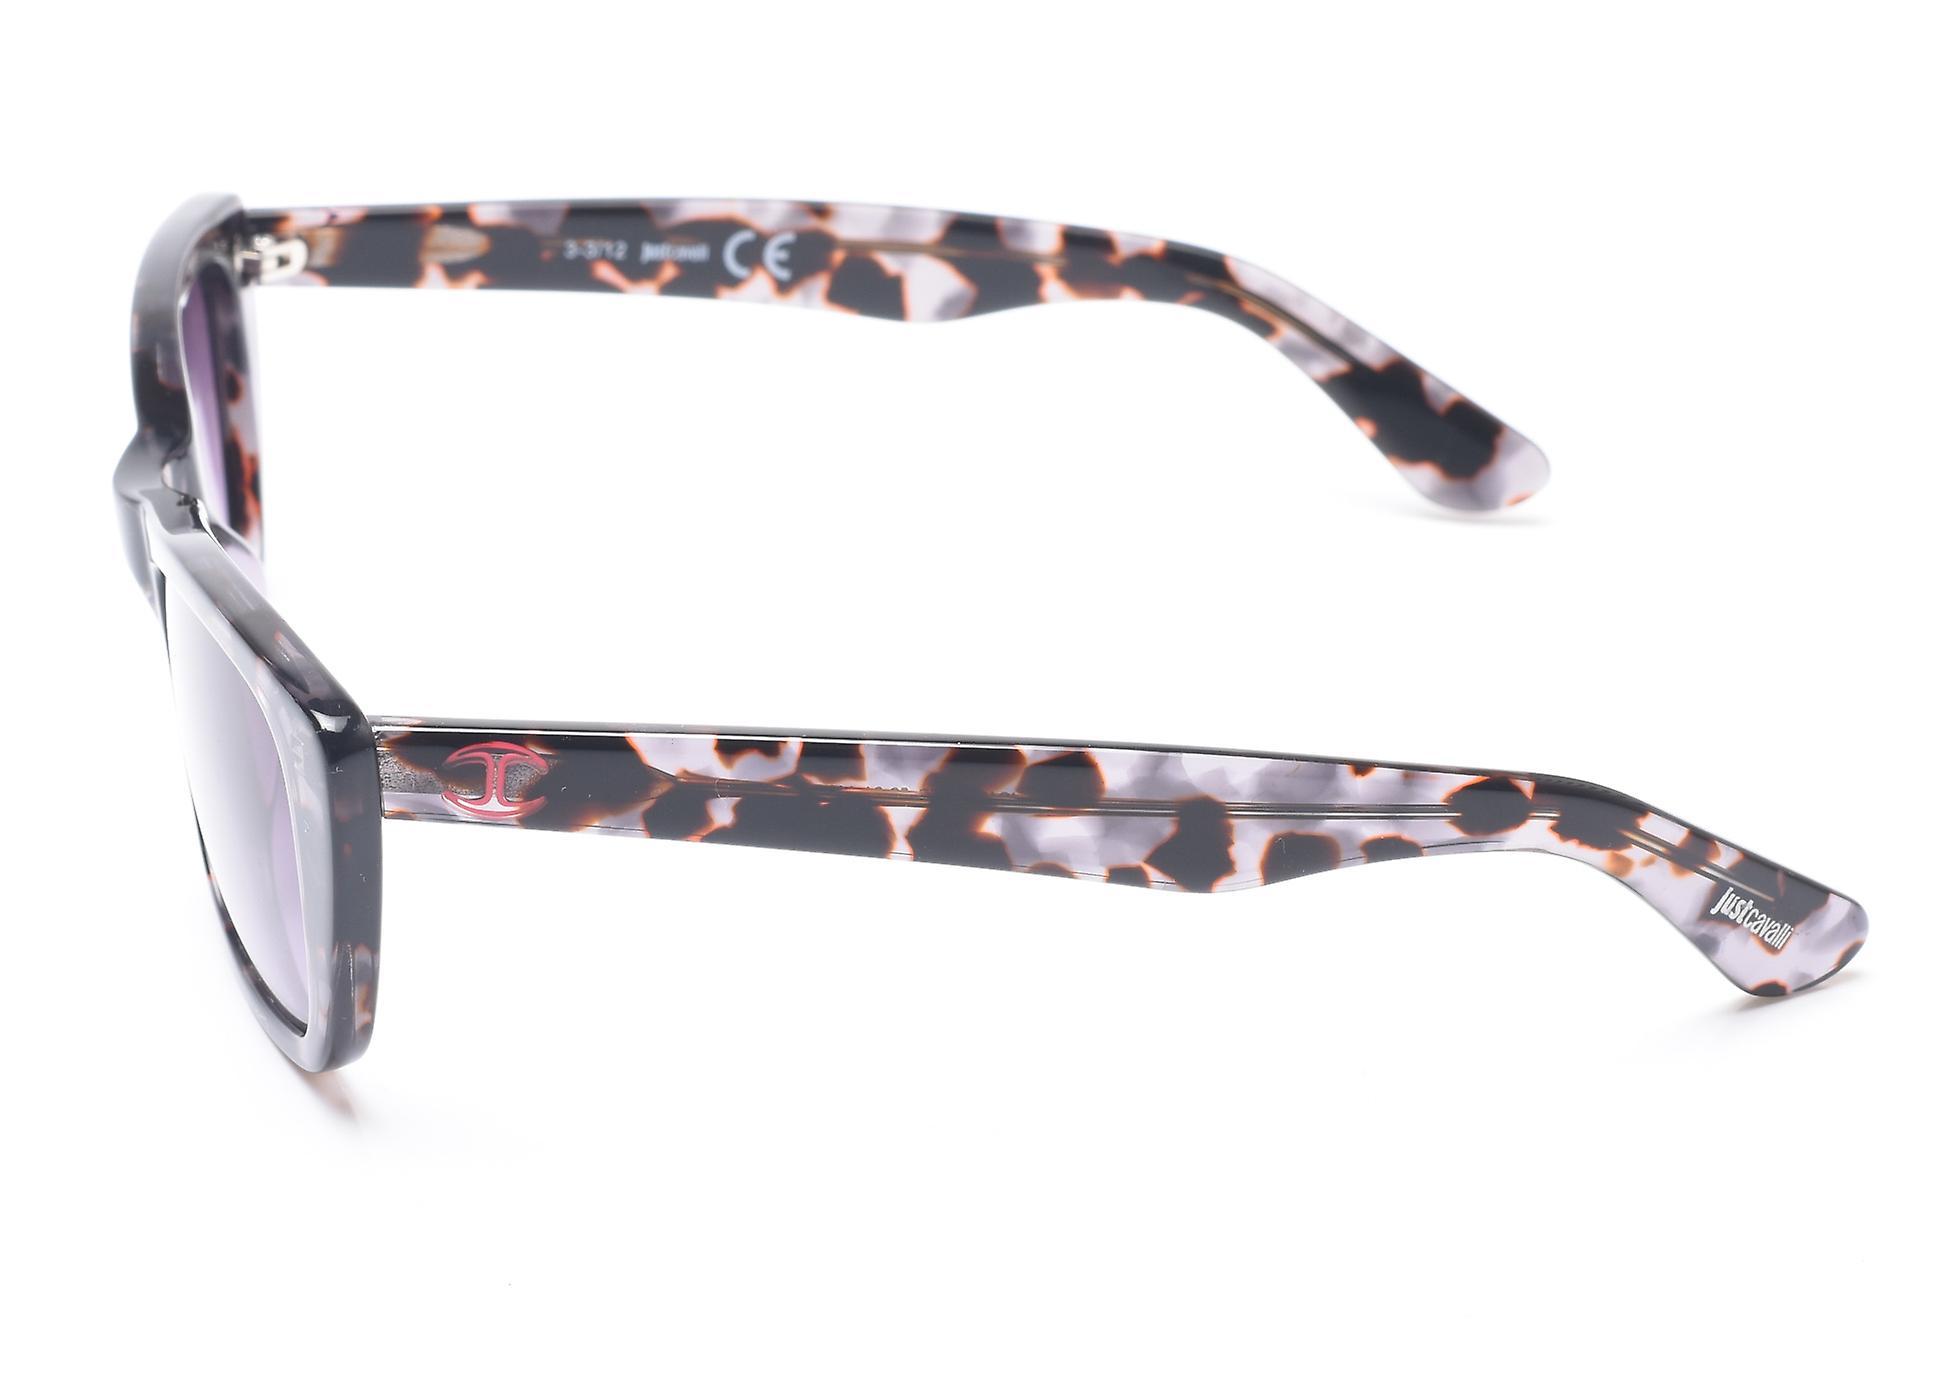 Just Cavalli Women's Classy Rectangular Frame Sunglasses Brown